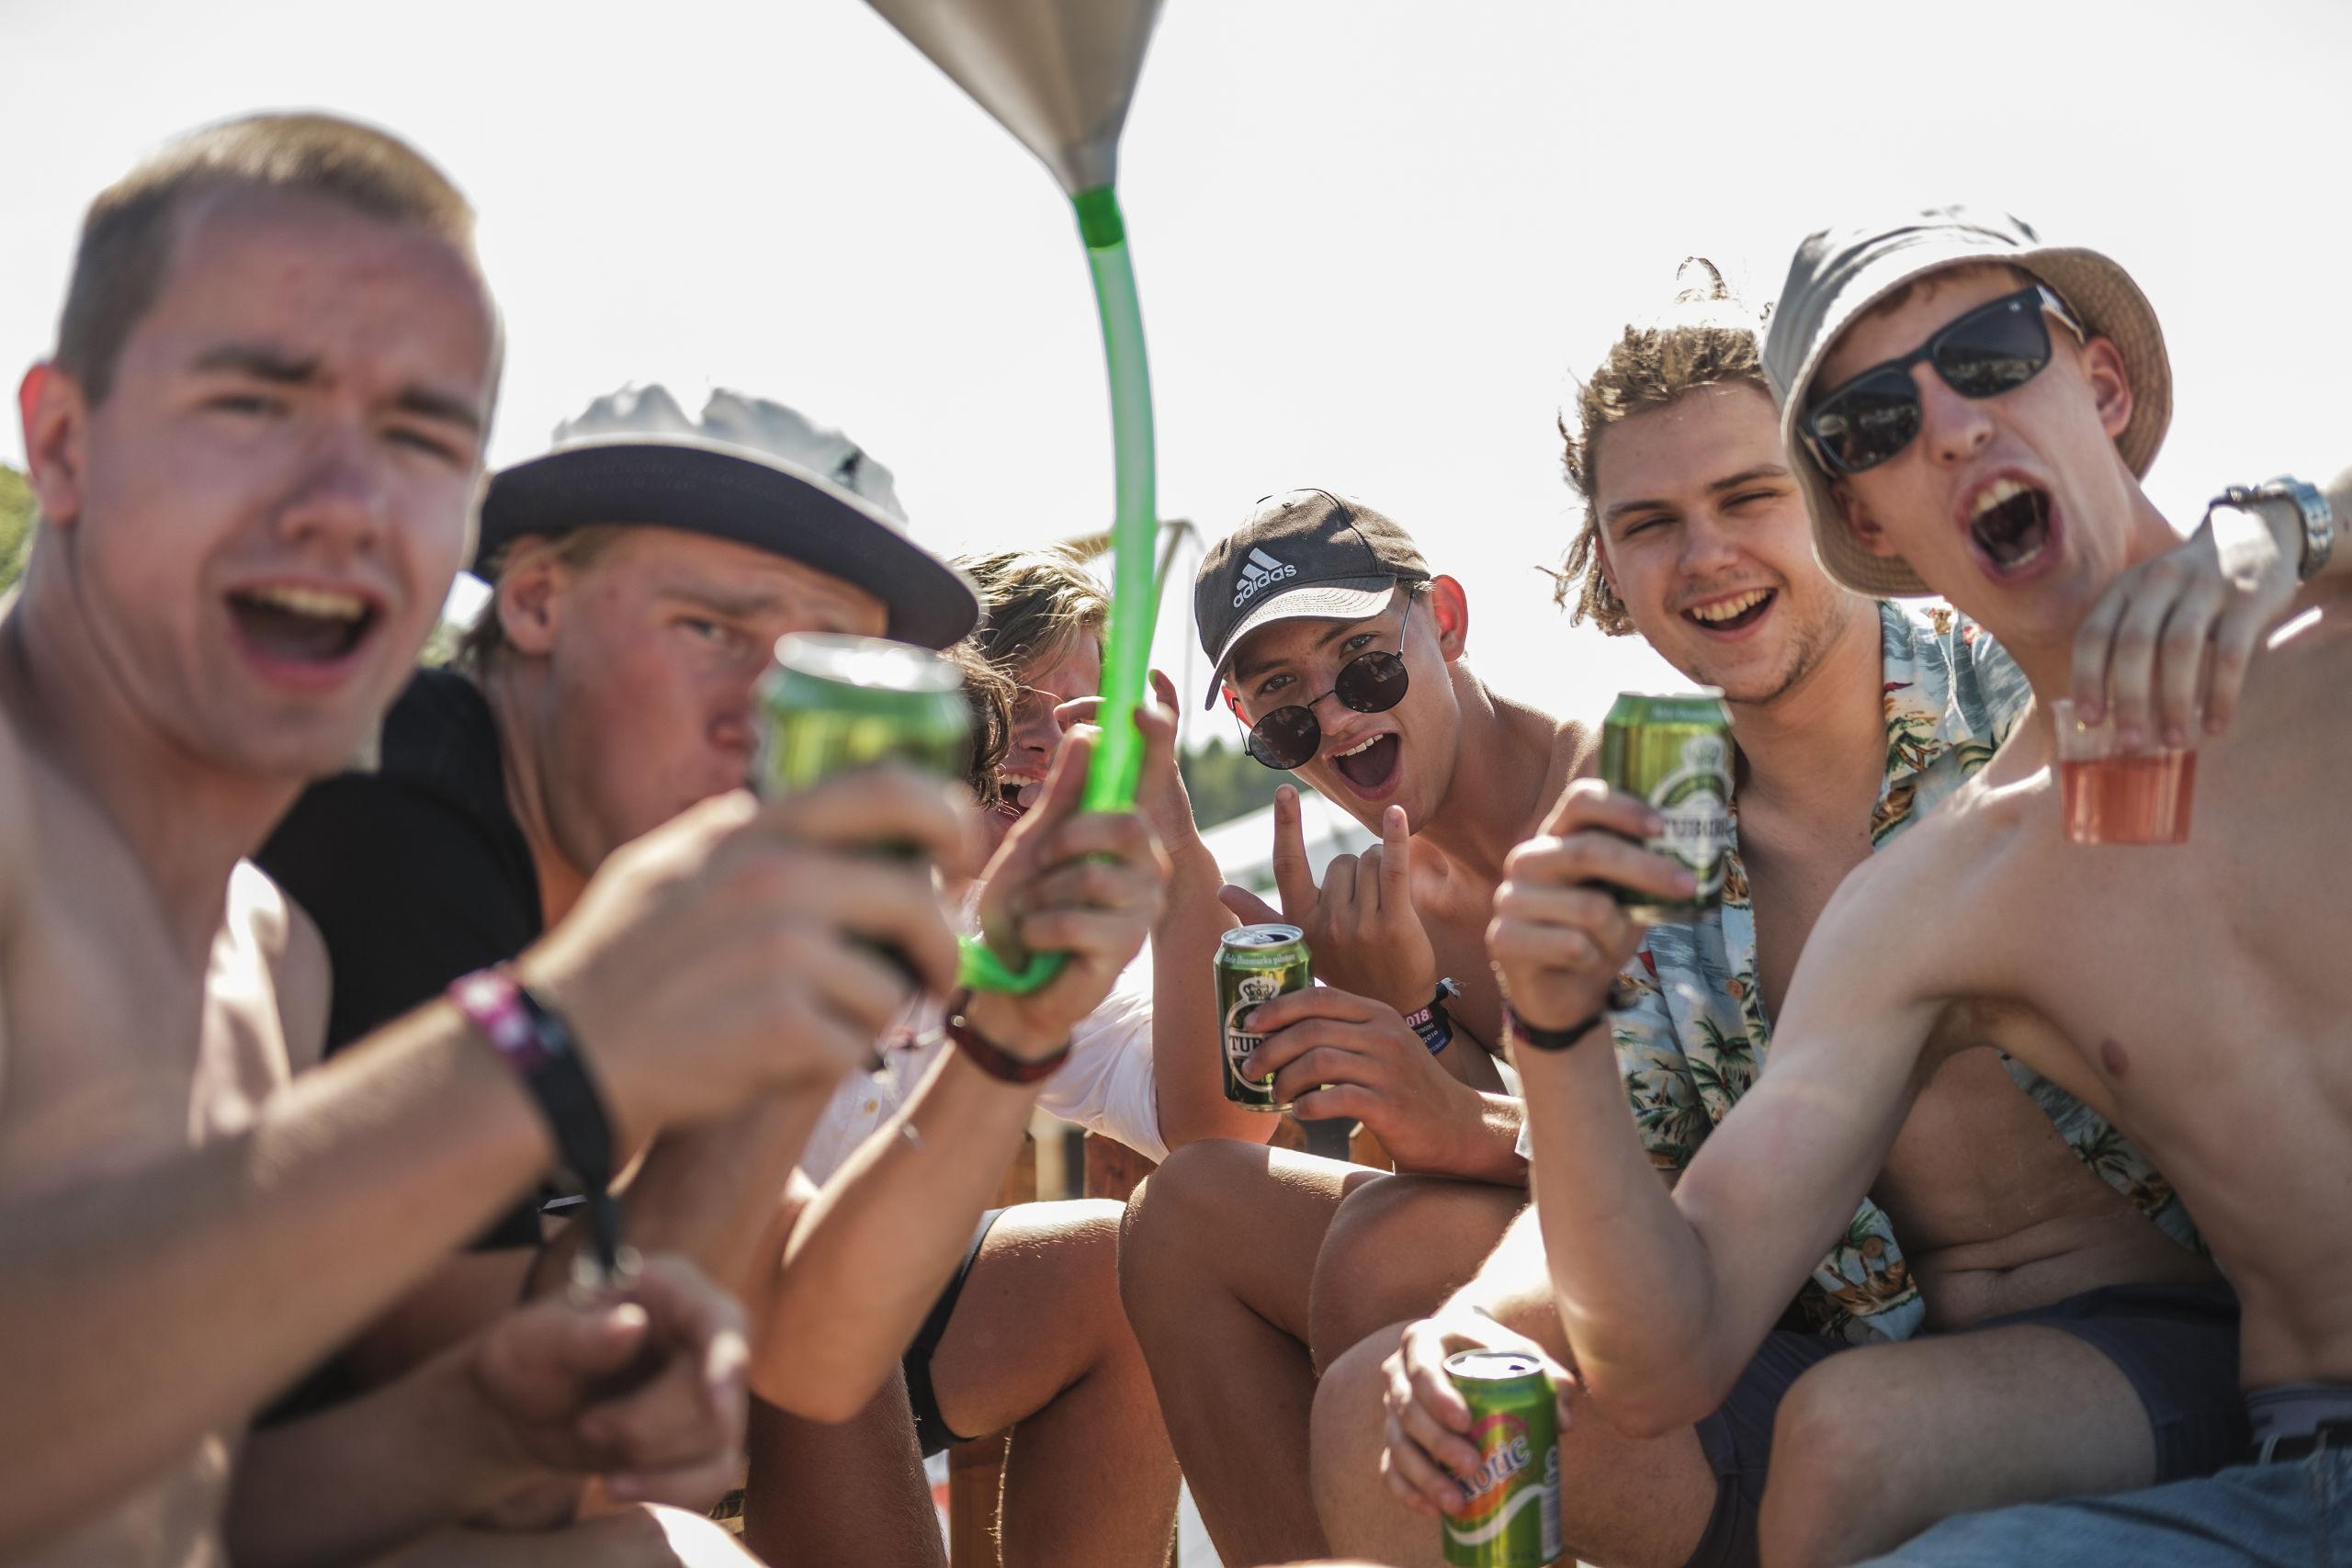 Der er blevet festet i over fire døgn på årets Nibe Festival.